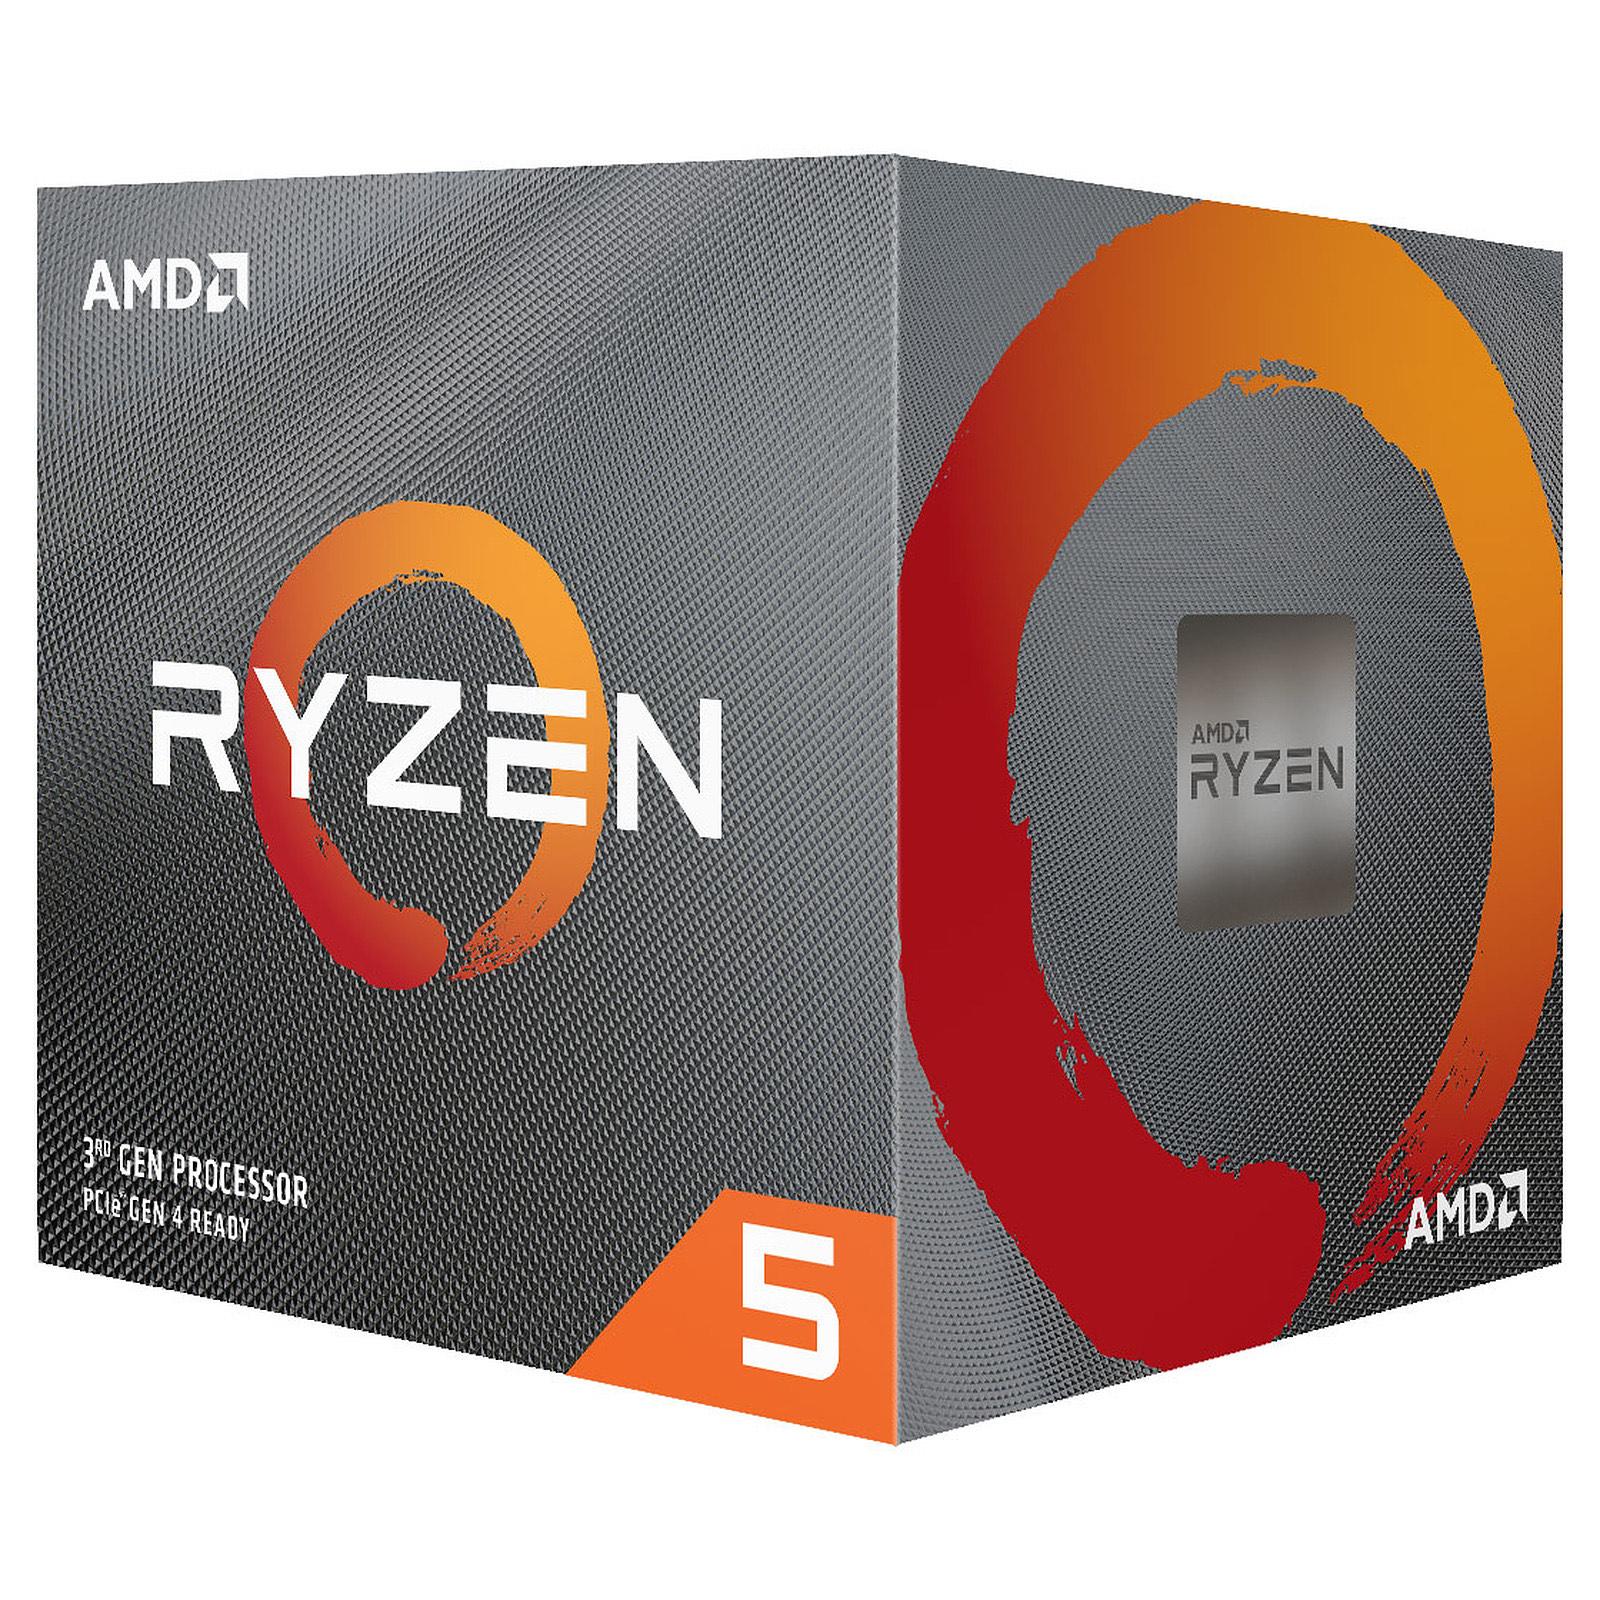 Processeur AMD Processeu Ryzen 5 3600 - Wraith Stealth cooler